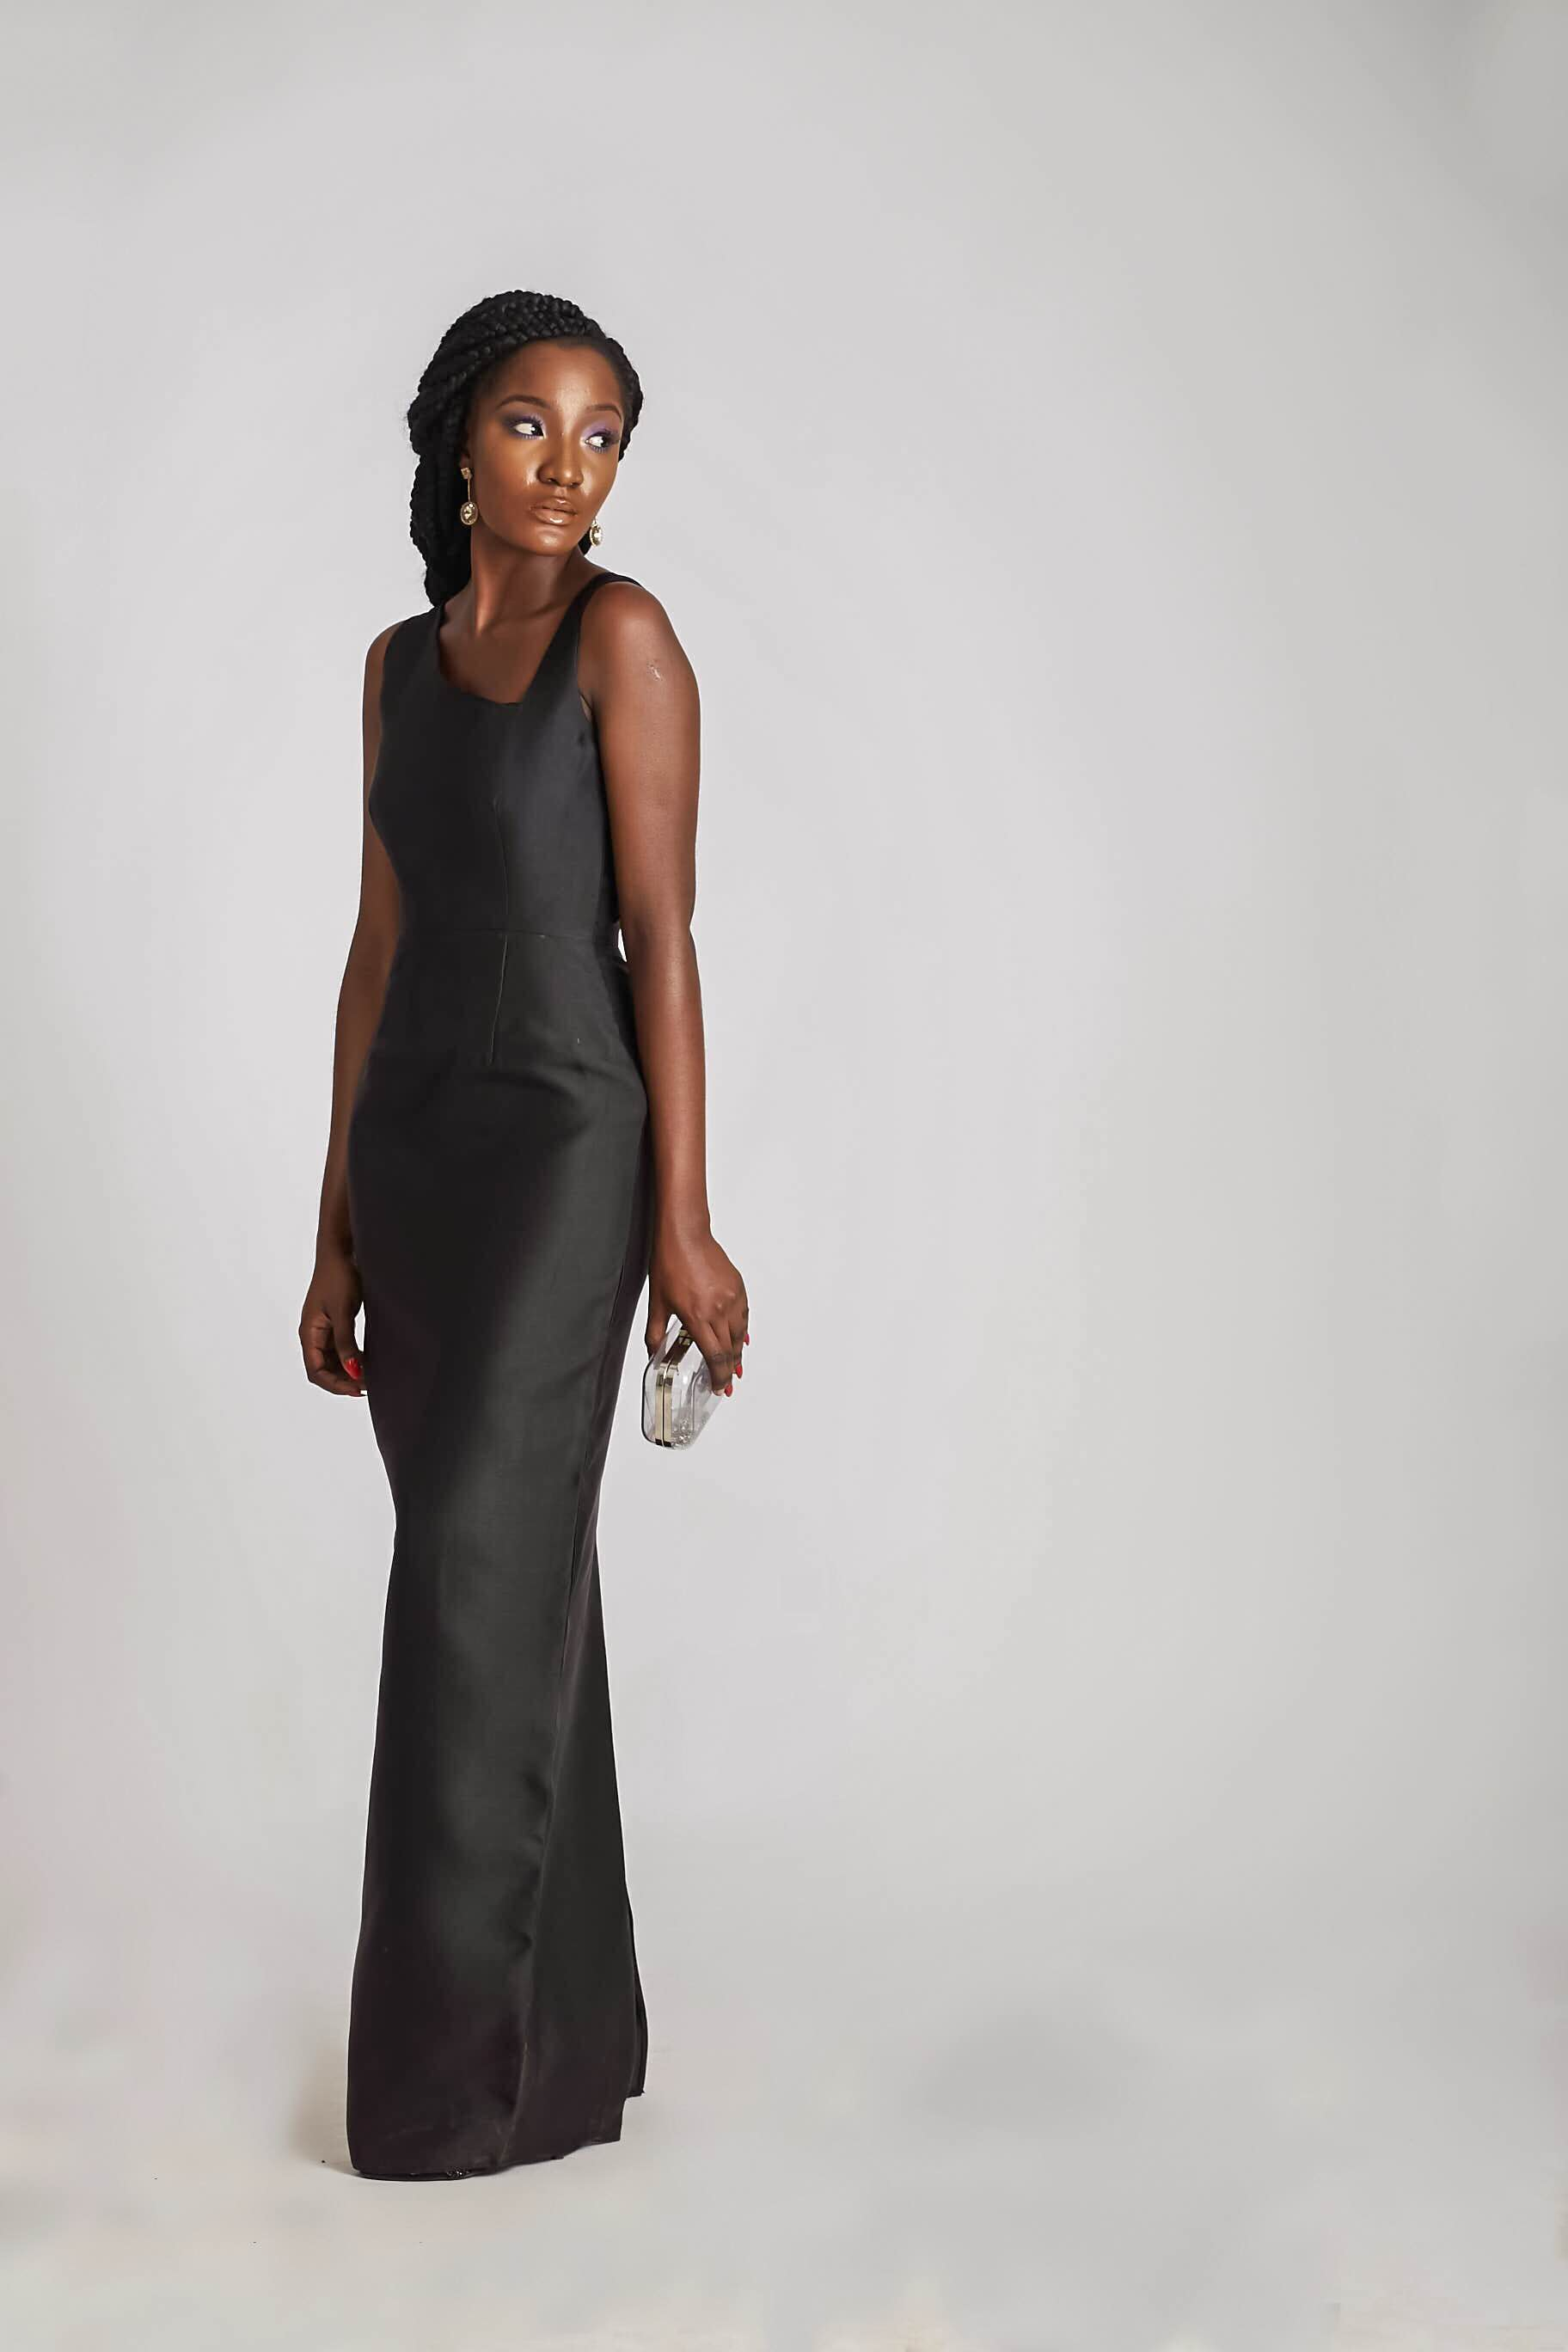 Imad Eduso - BN Style - Collection Lookbook - BellaNaija.com 020